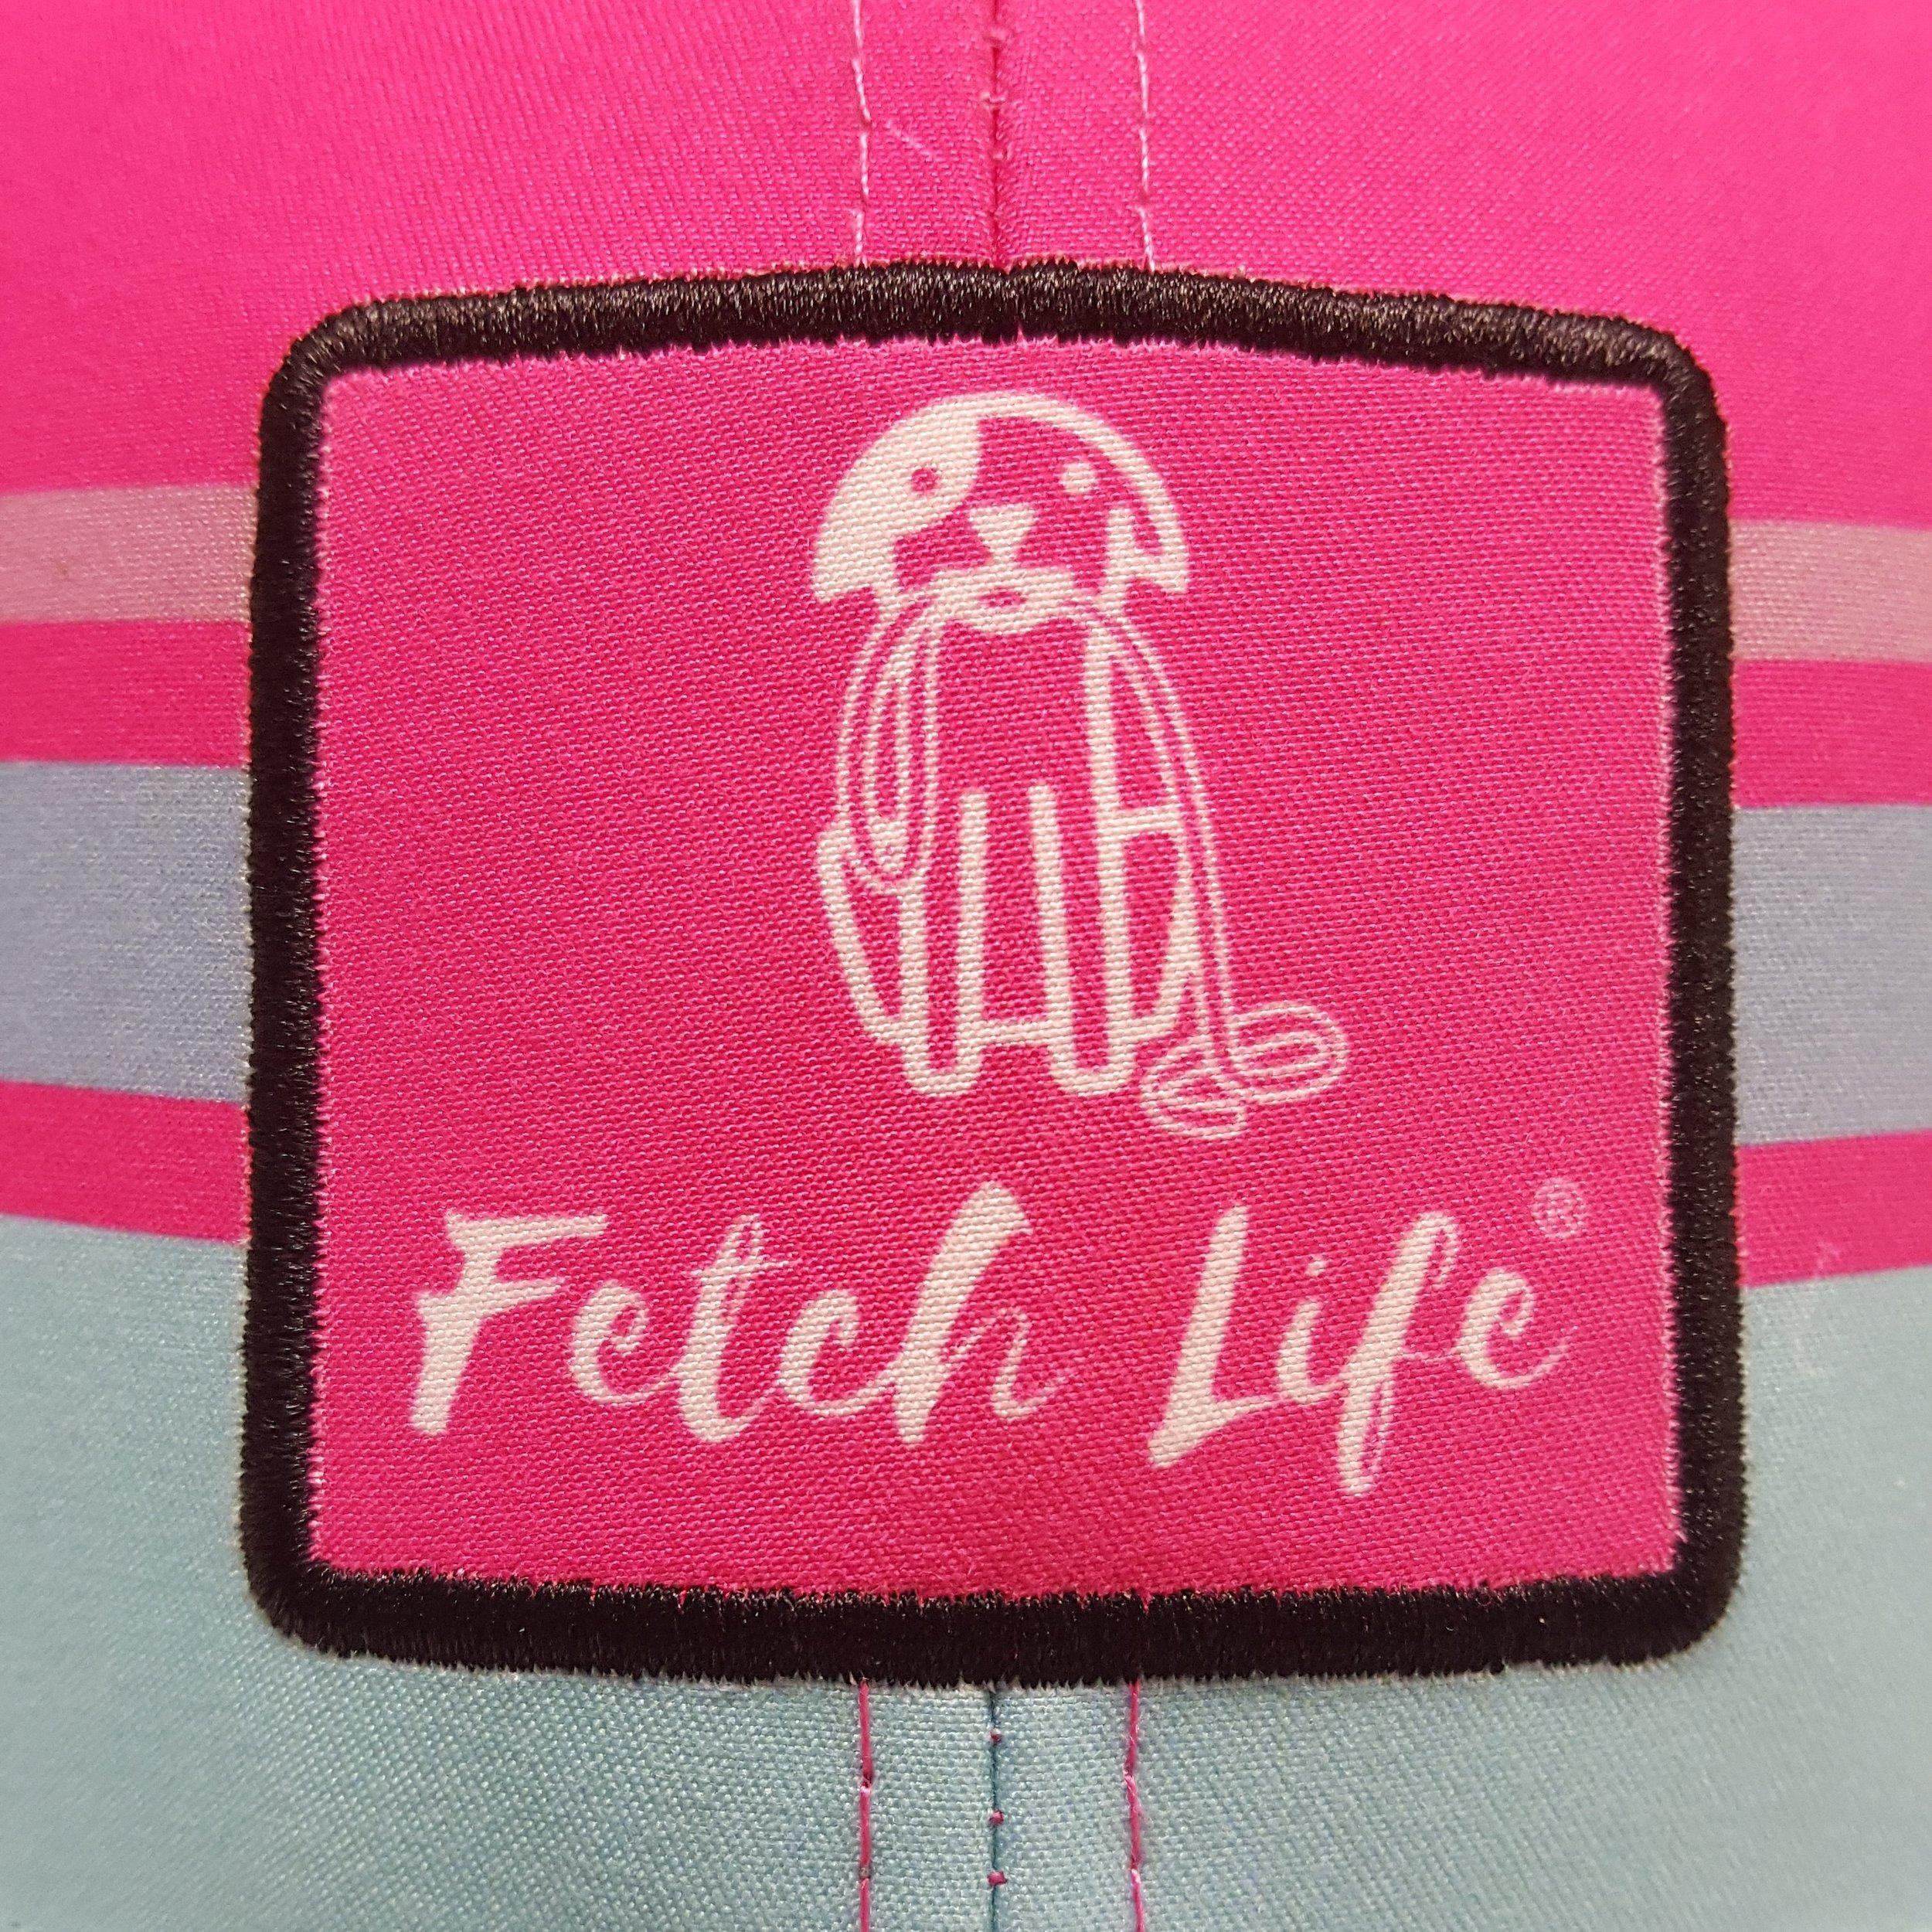 b9ee28d3e Fetch Life® Technical Trucker Hat - Pink/Black — Fetch Life Stuff